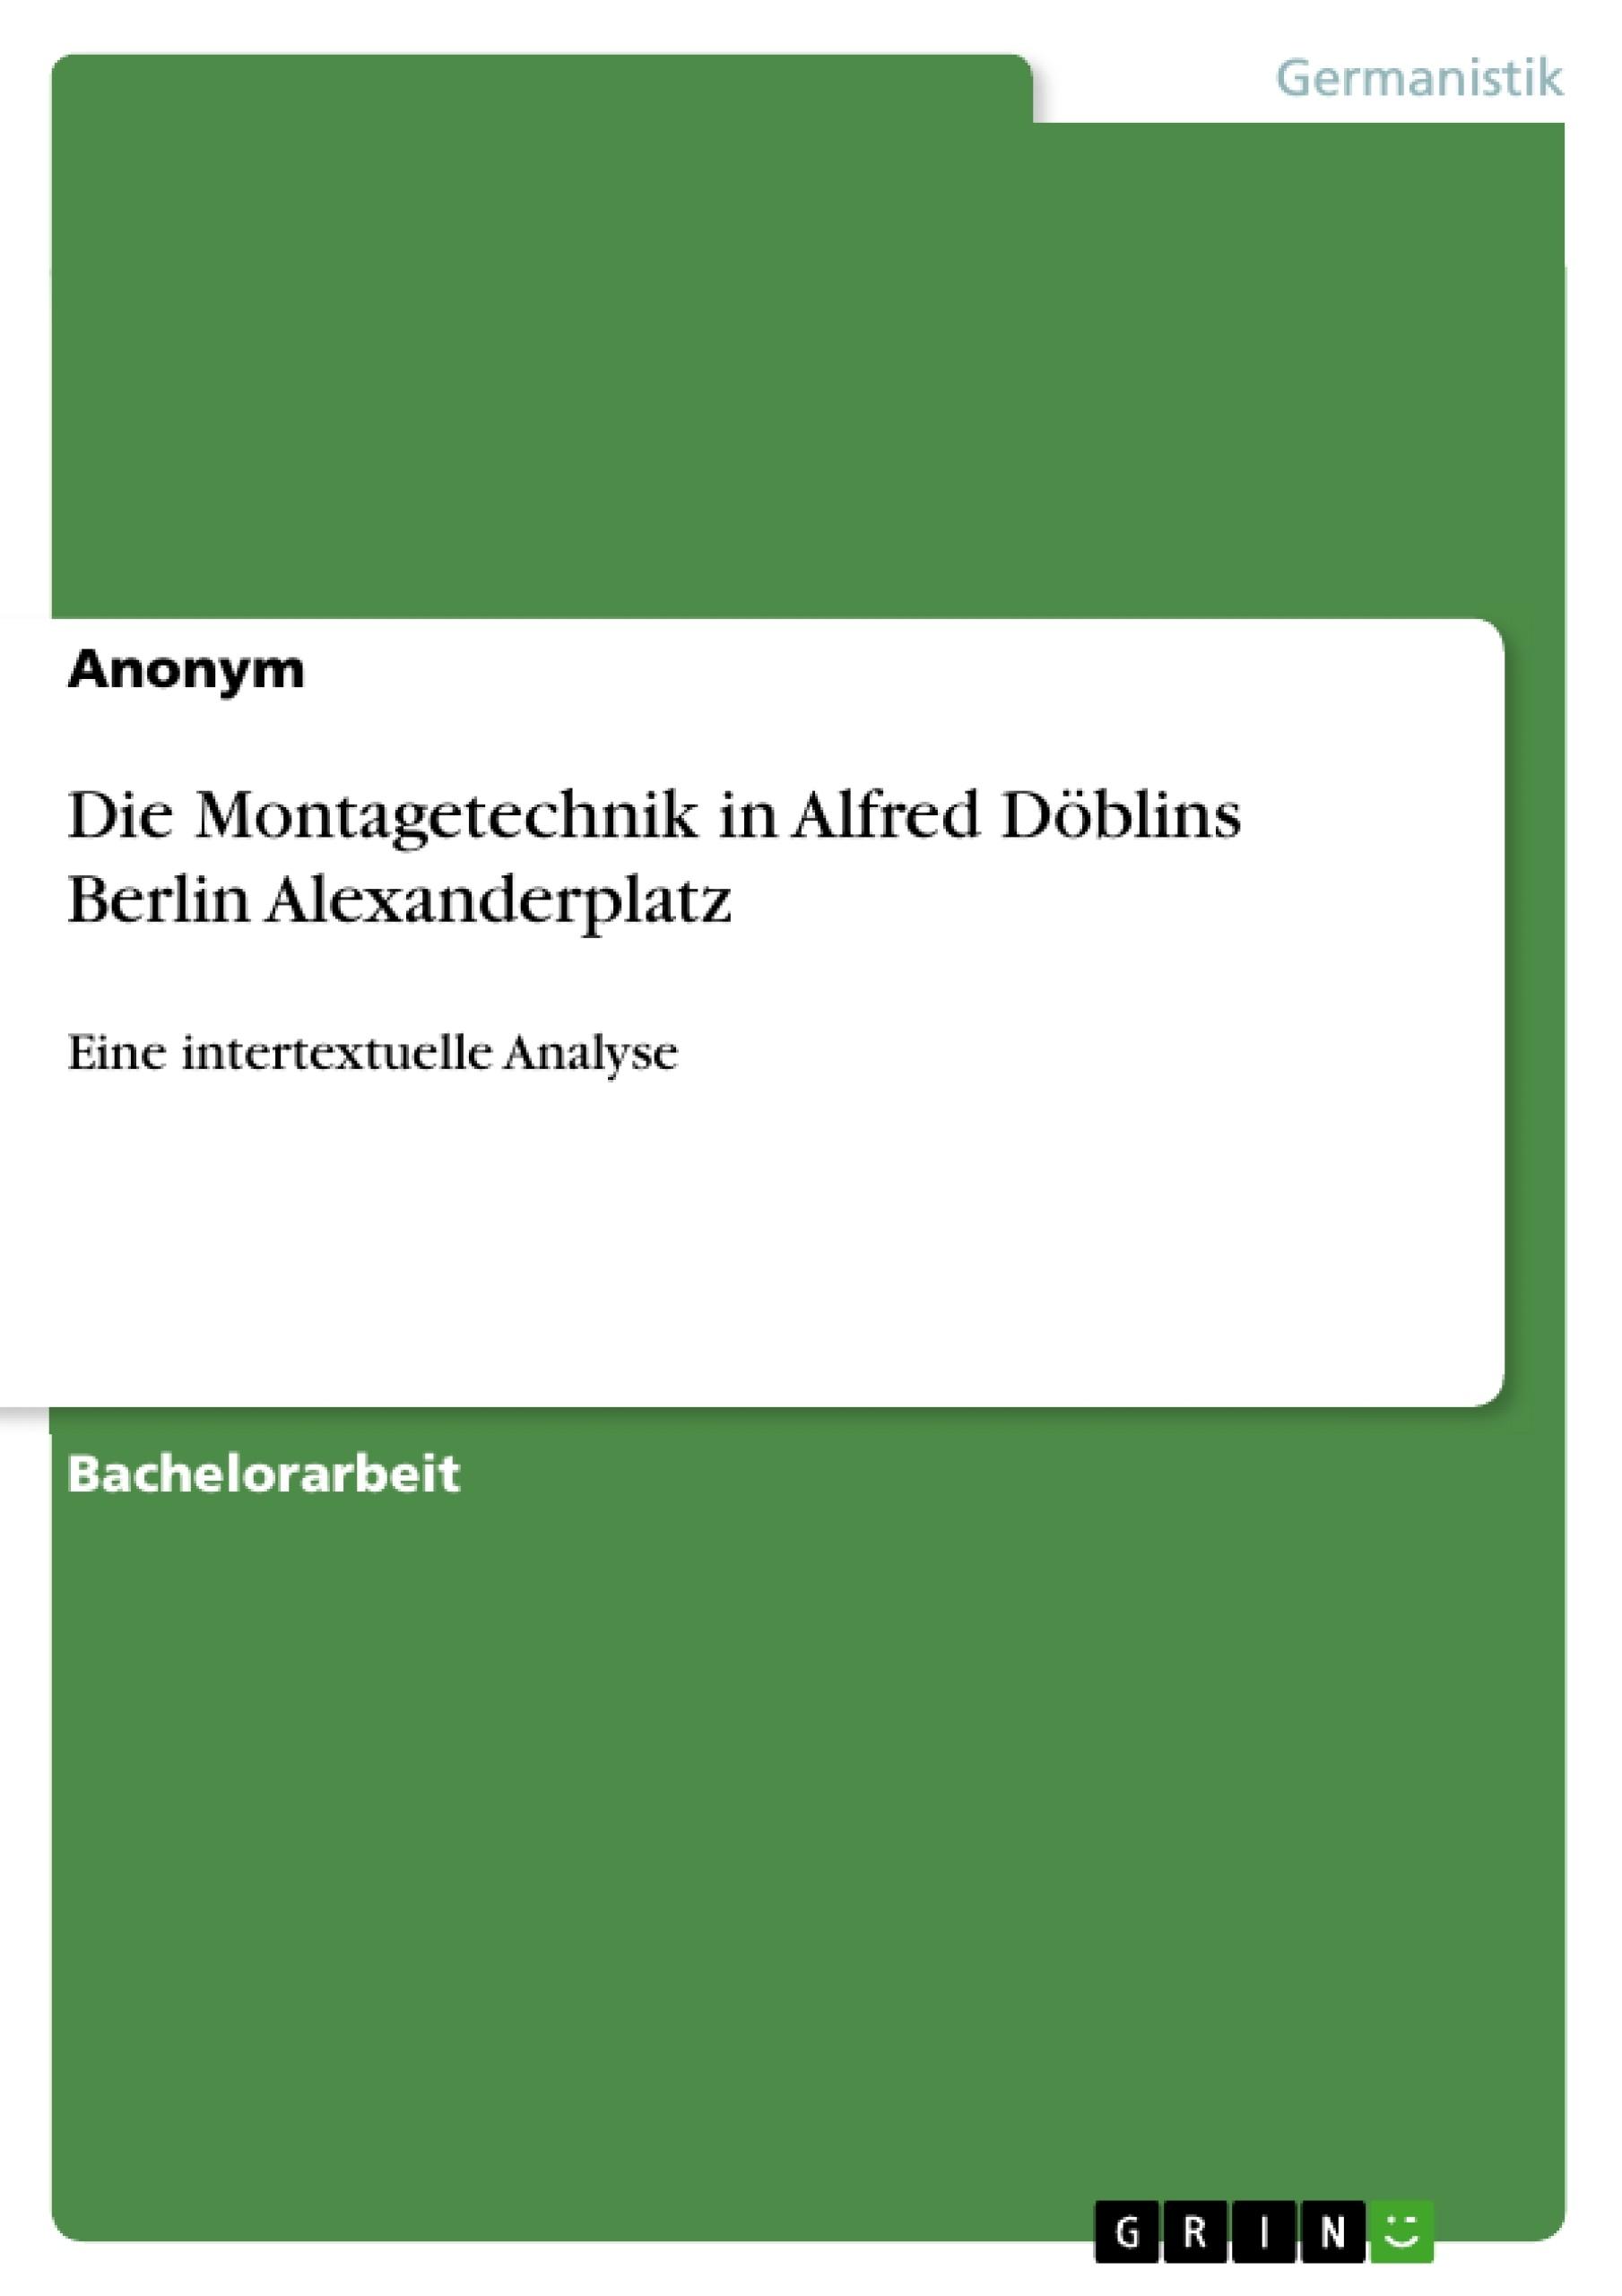 Titel: Die Montagetechnik in Alfred Döblins  Berlin Alexanderplatz